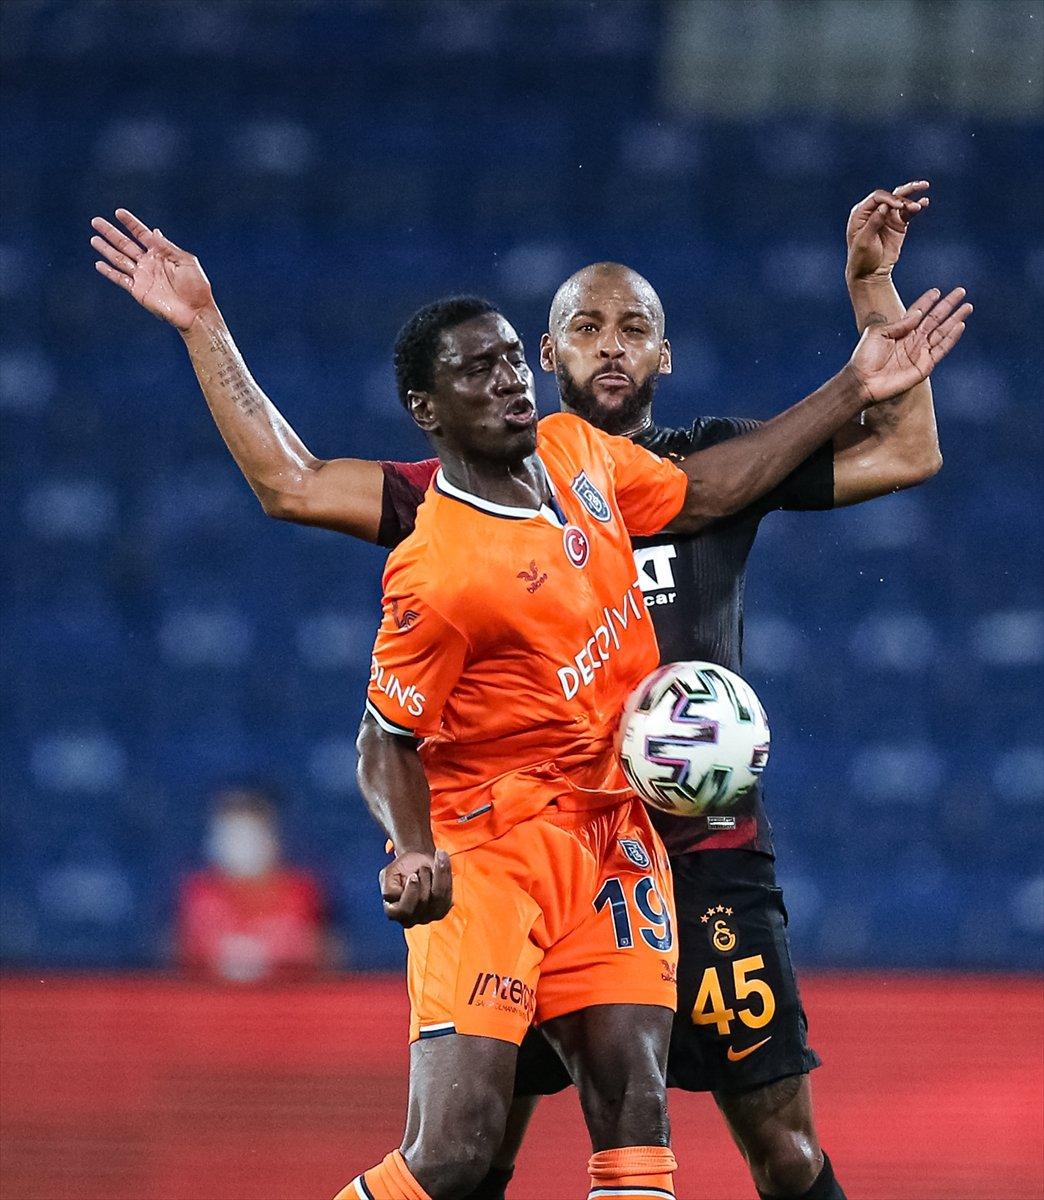 Galatasaray son şampiyon Başakşehir i devirdi #2